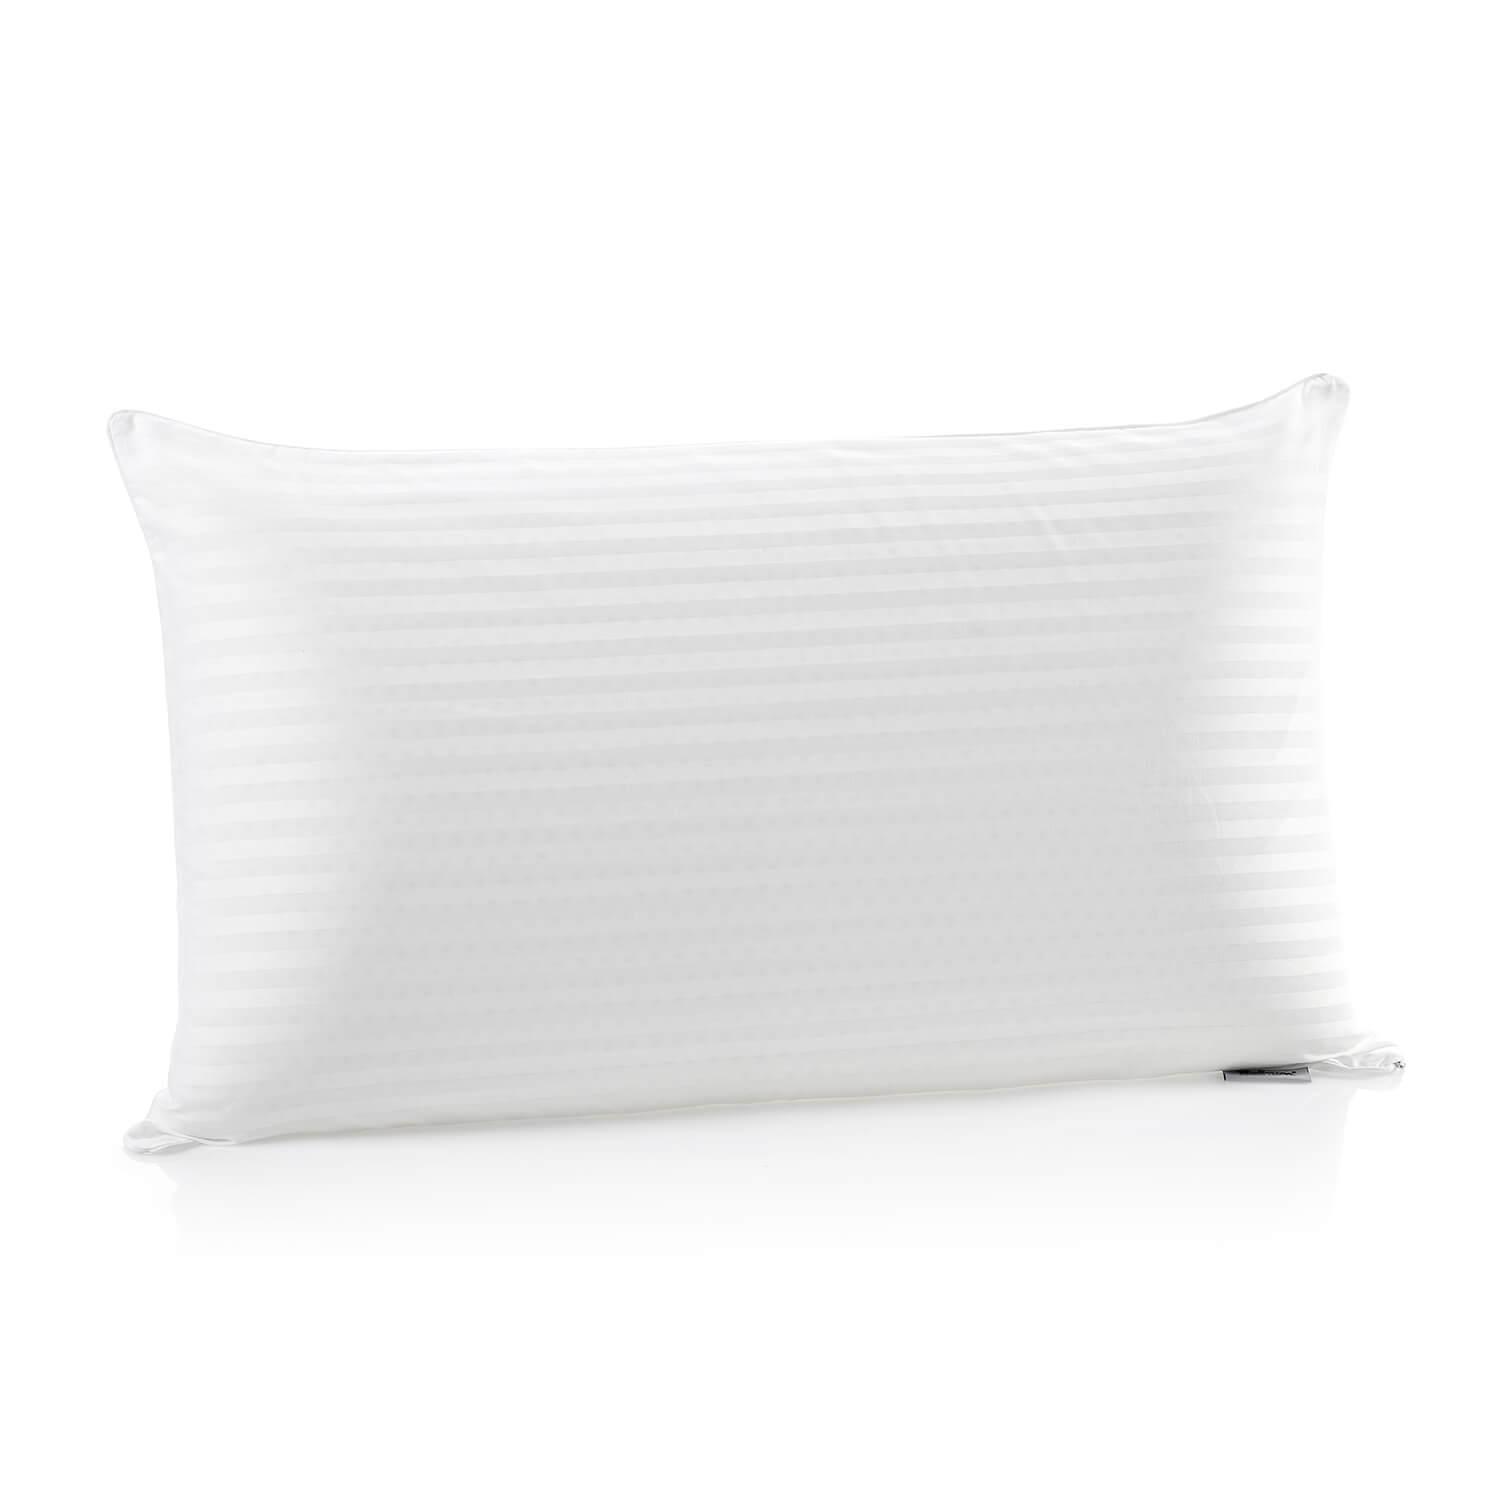 Relyon Super Comfort Pillow